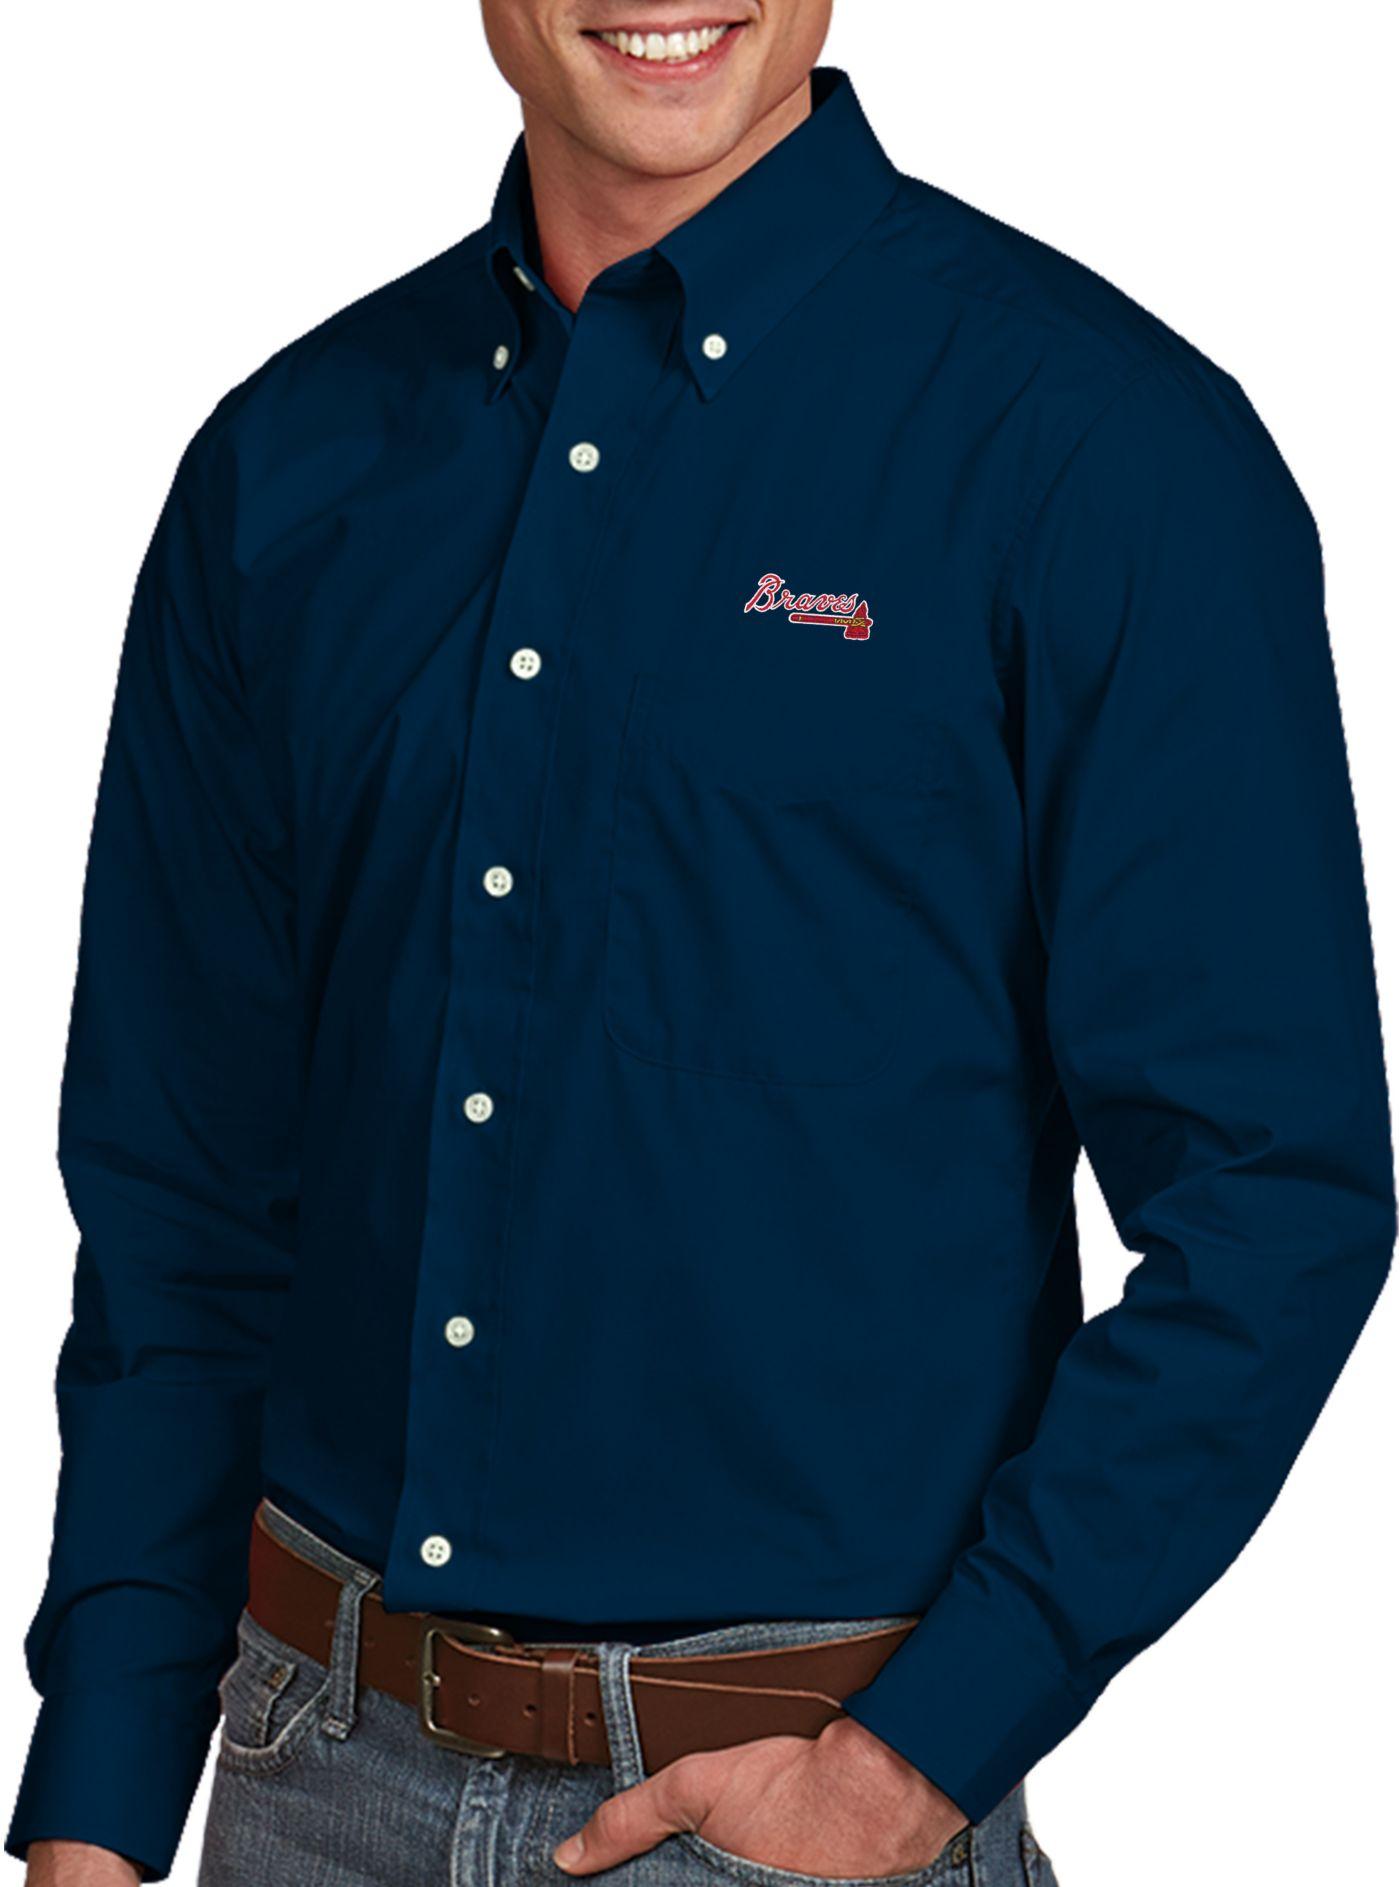 Antigua Men's Atlanta Braves Dynasty Button-Up Navy Long Sleeve Shirt